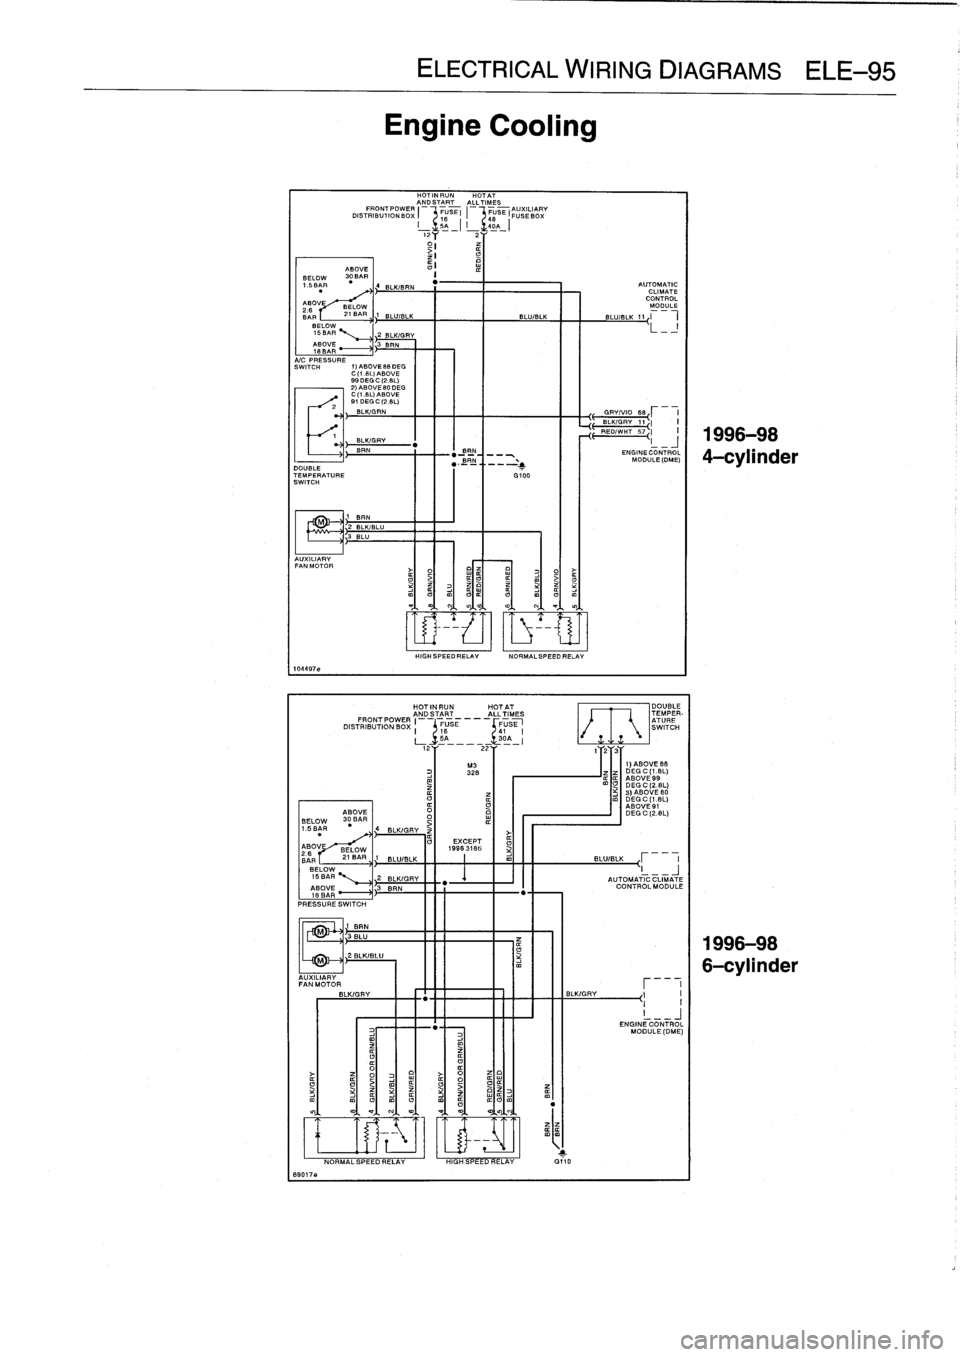 bmw 318i 1996 e36 workshop manual